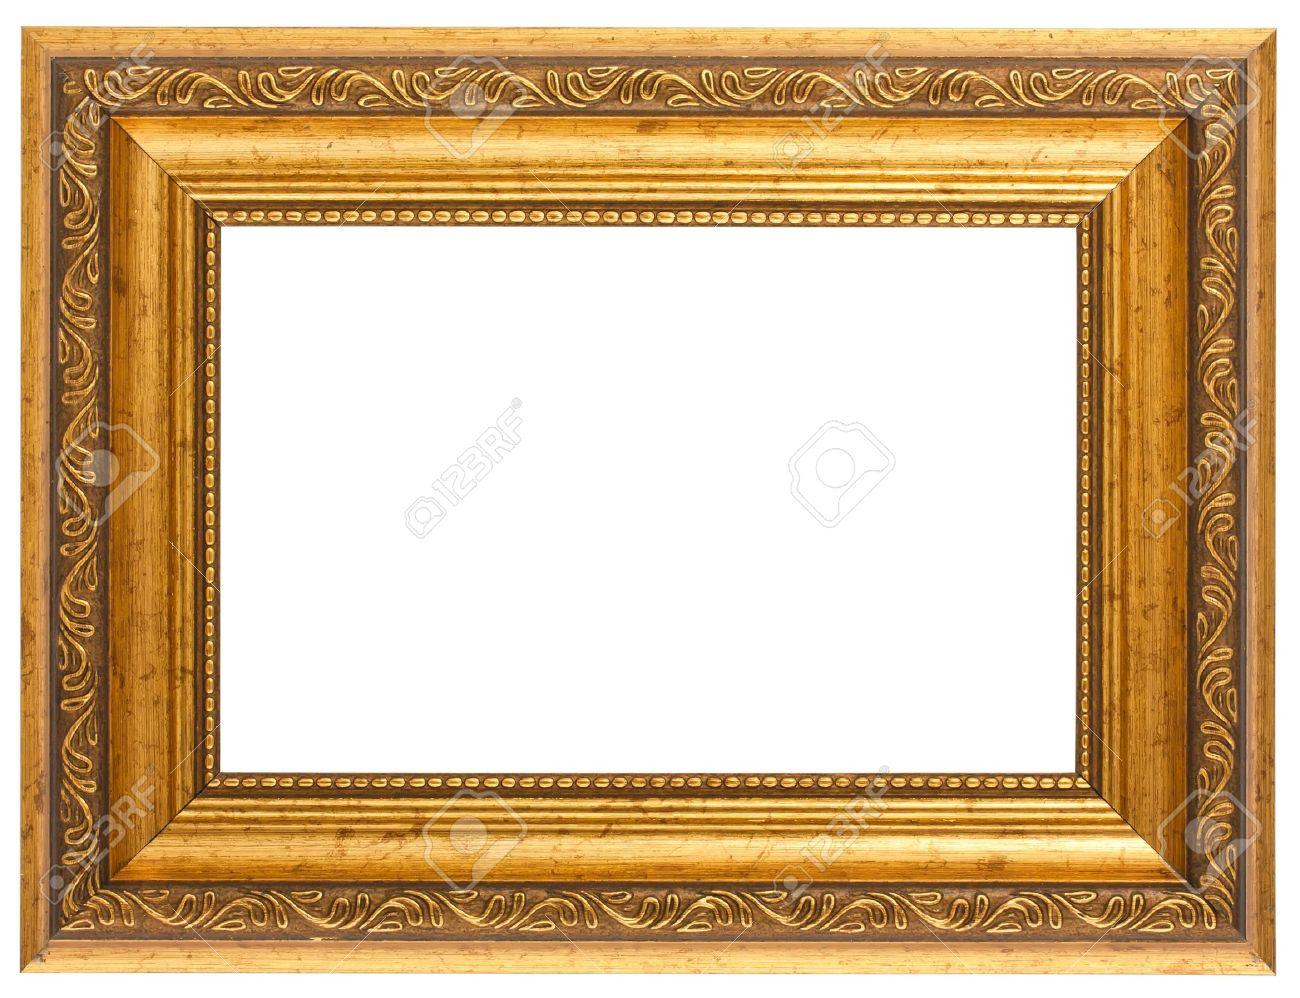 Golden antique frame isolated on white background Stock Photo - 9390306